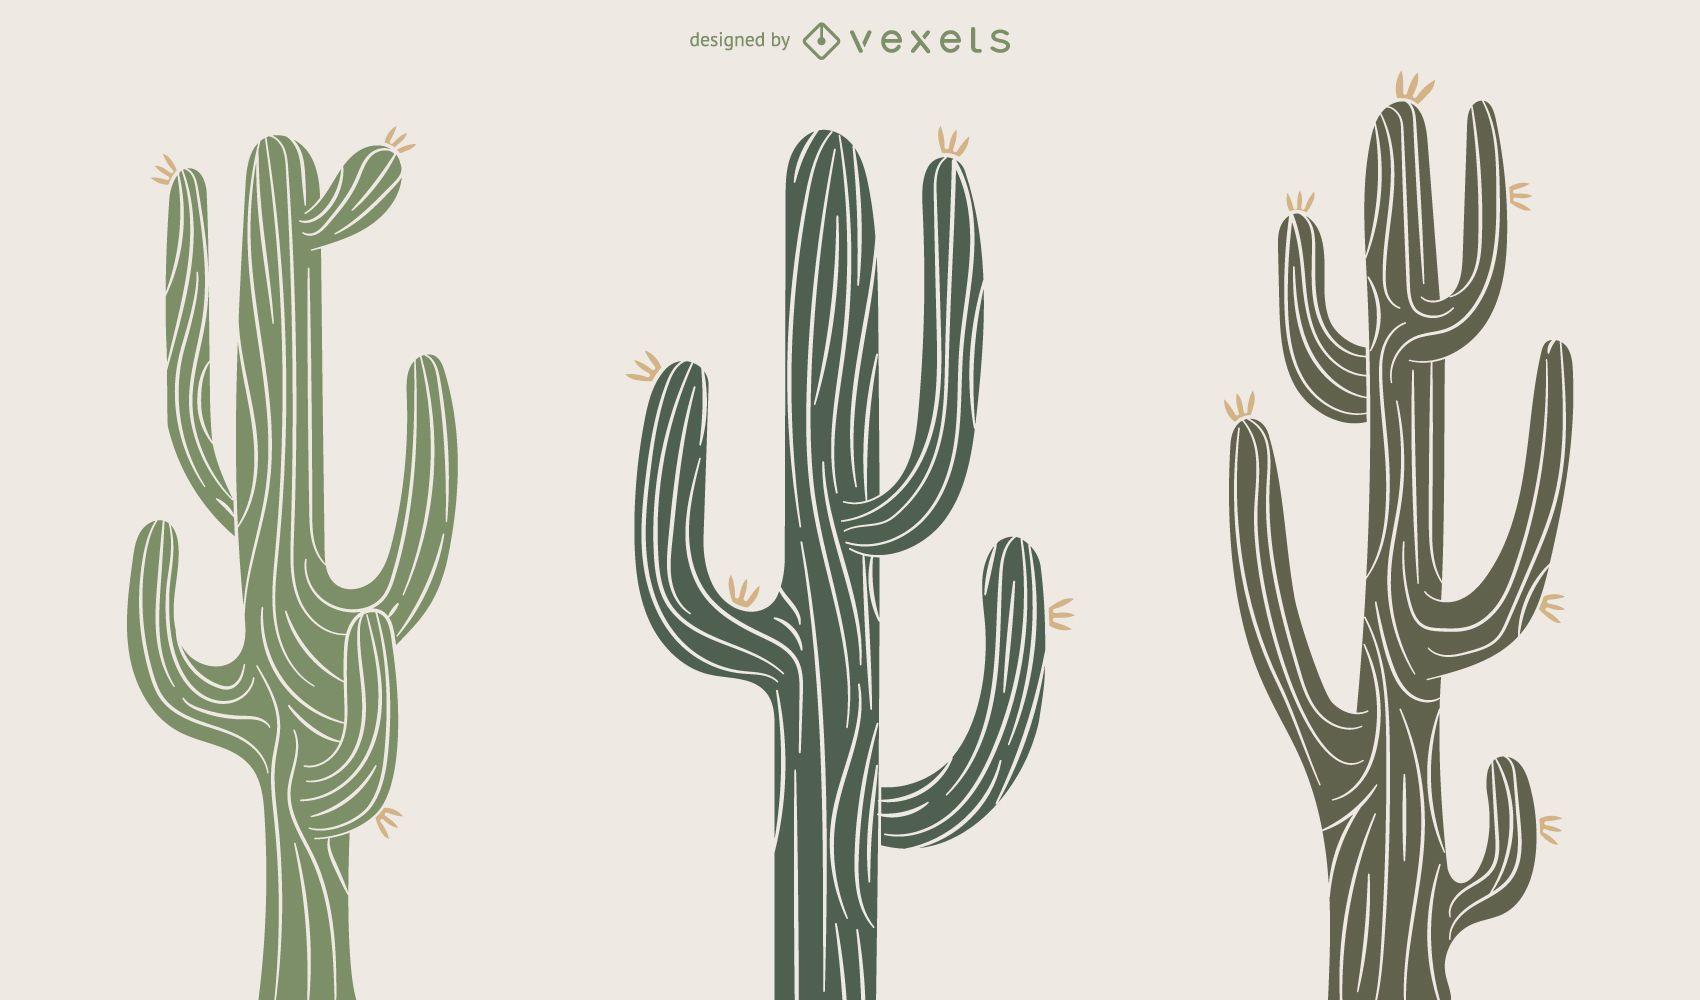 Cactus plant illustration set